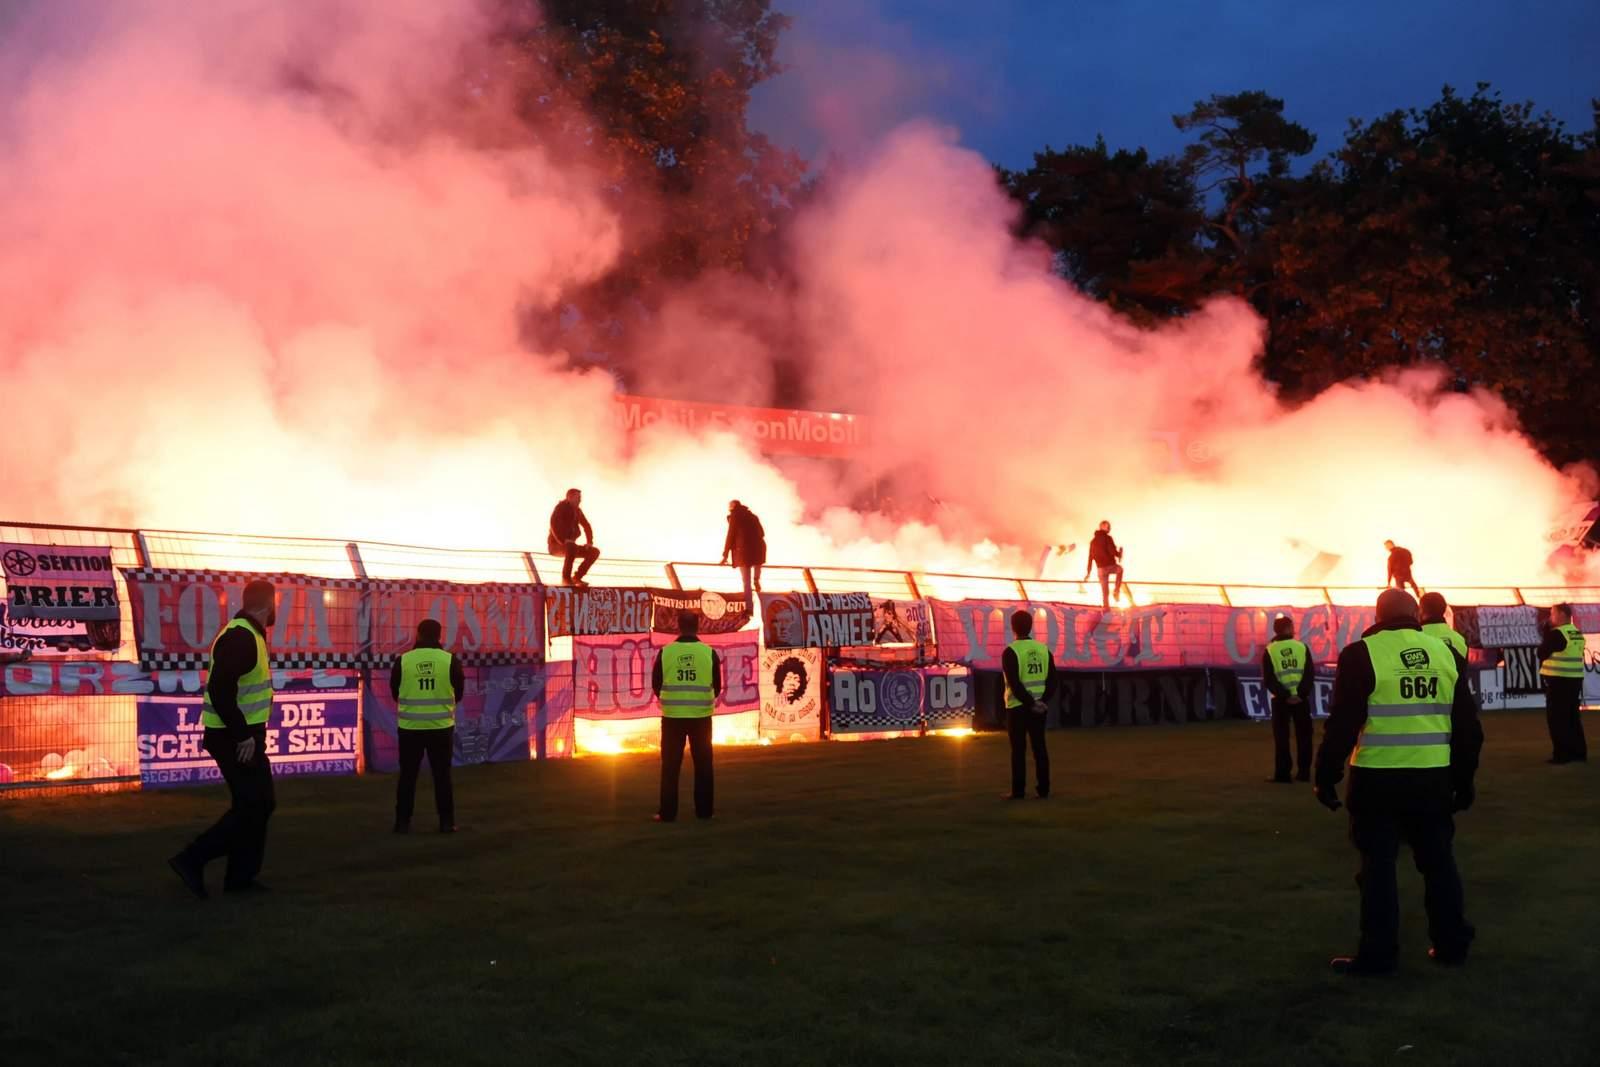 Osnabrücker Anhänger zünden Pyro im Fanblock